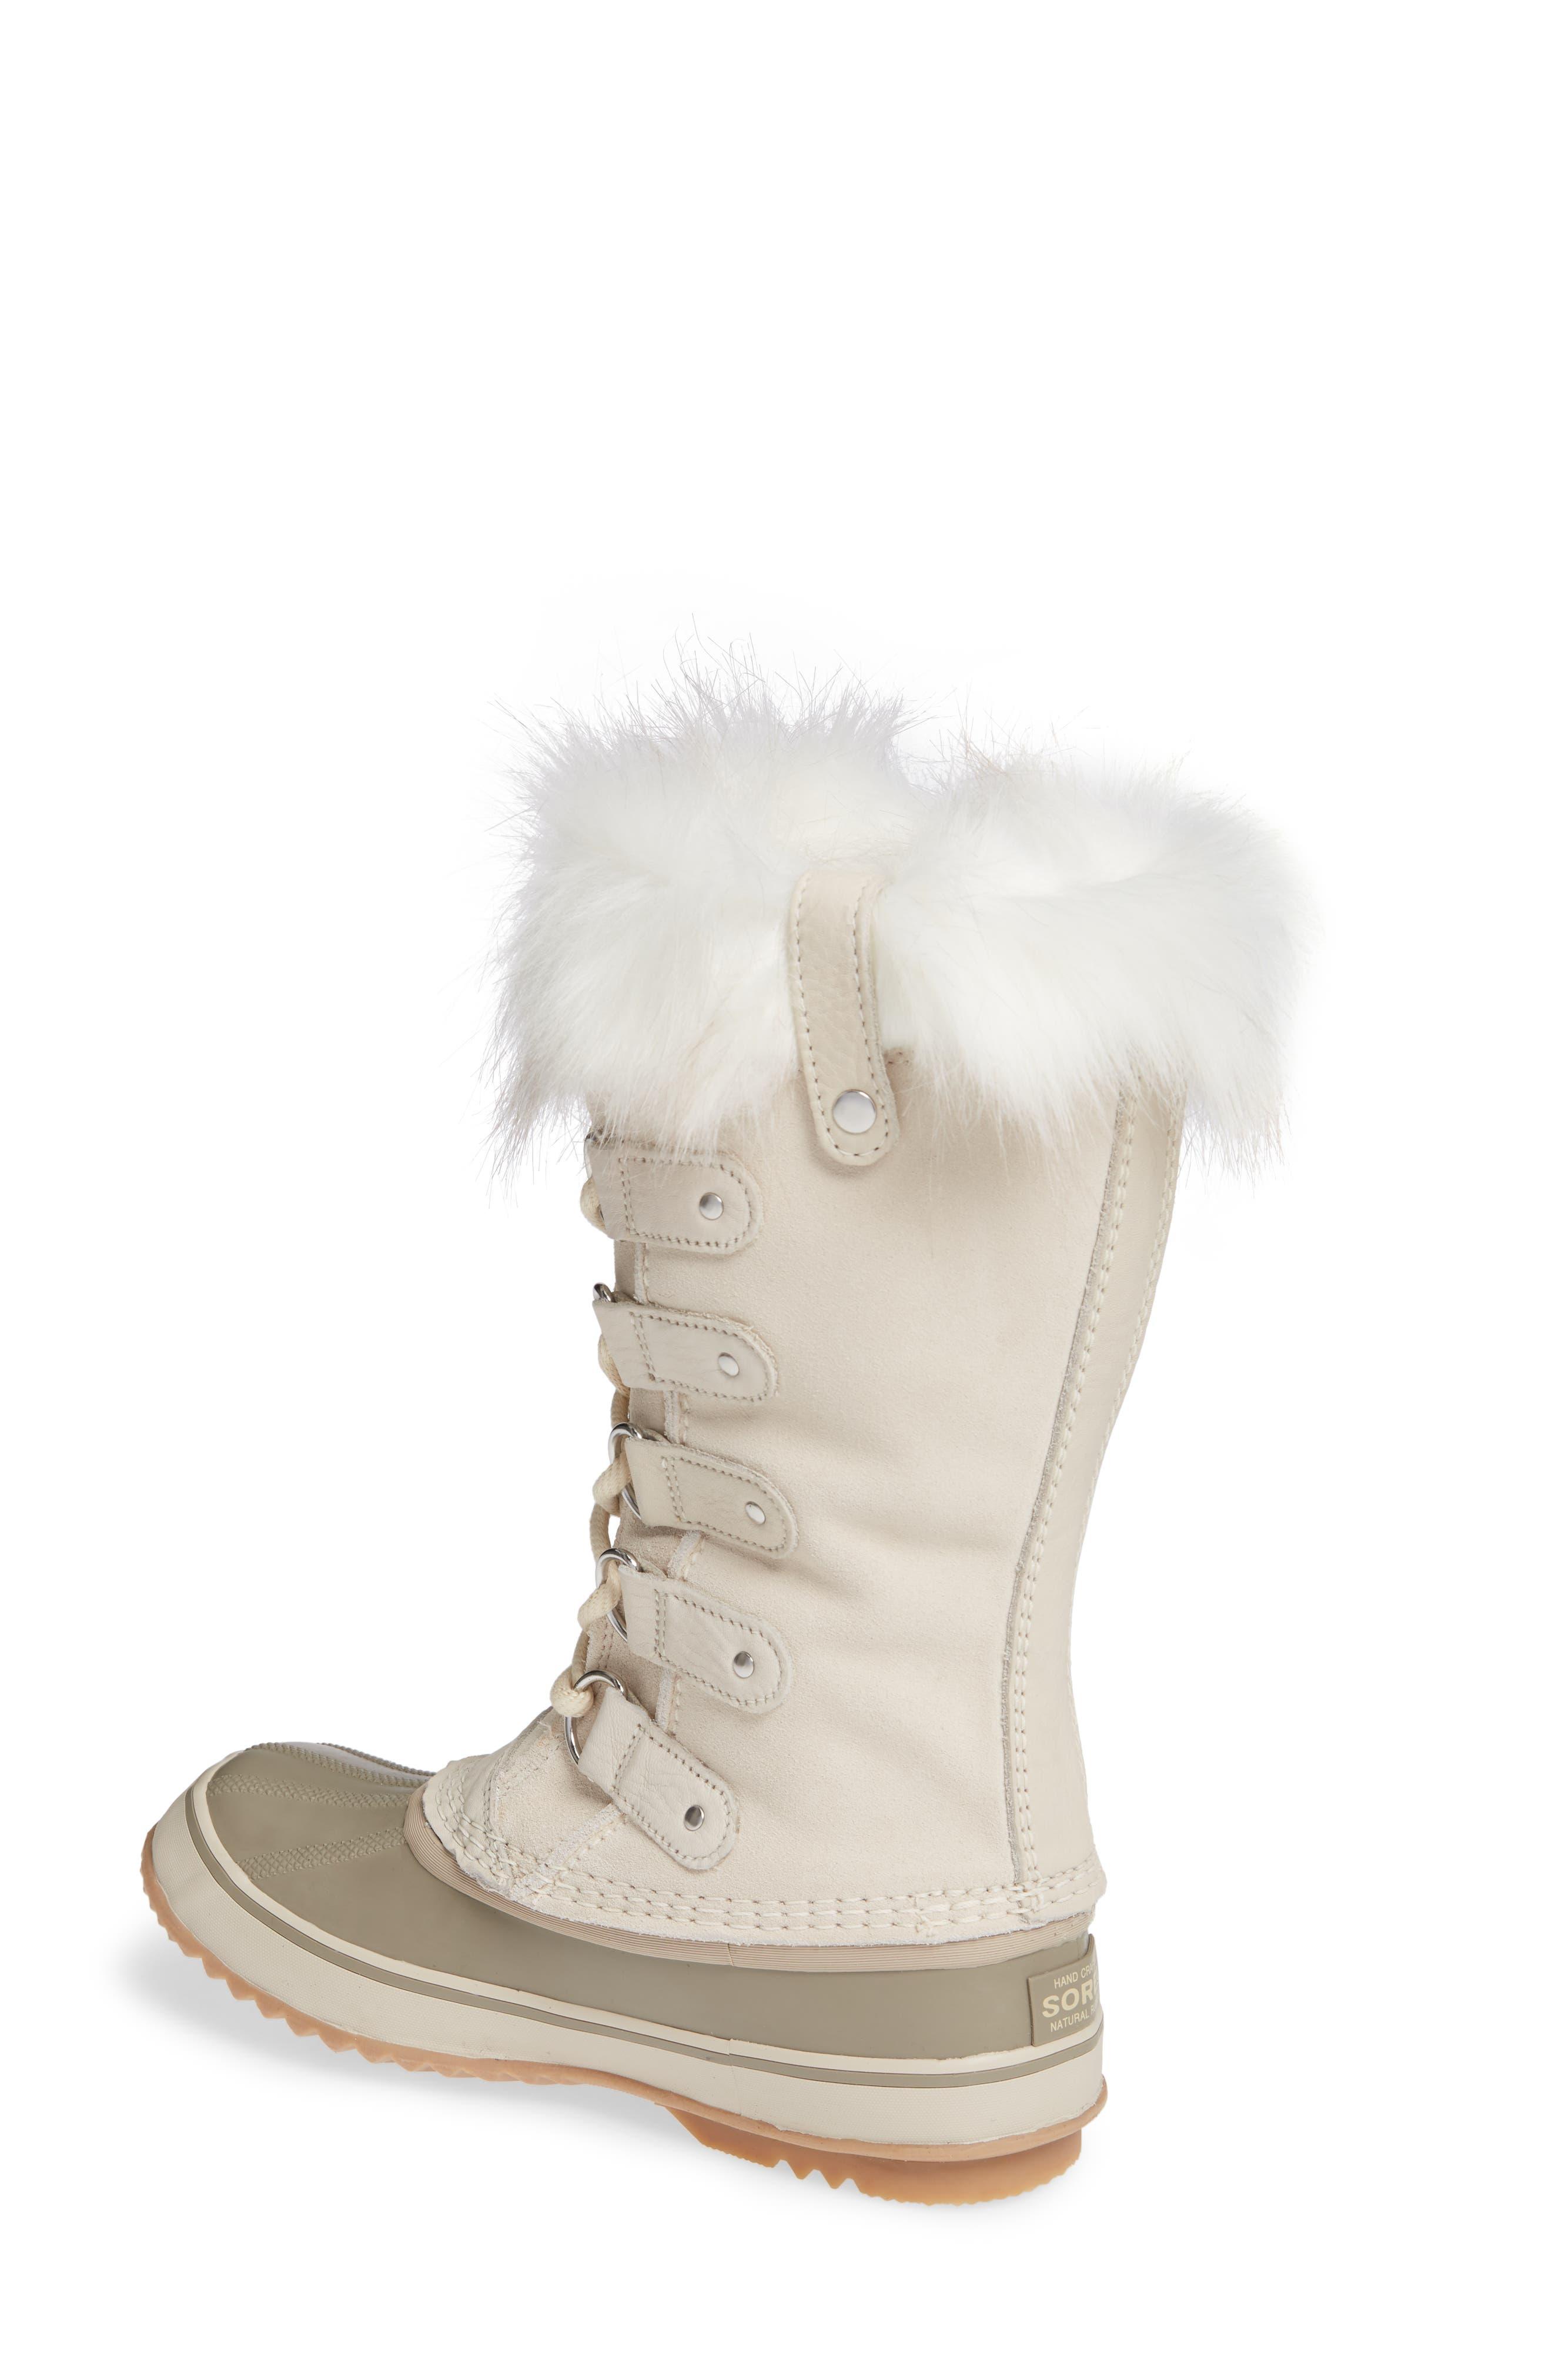 c5775897454c Women s Winter   Snow Boots